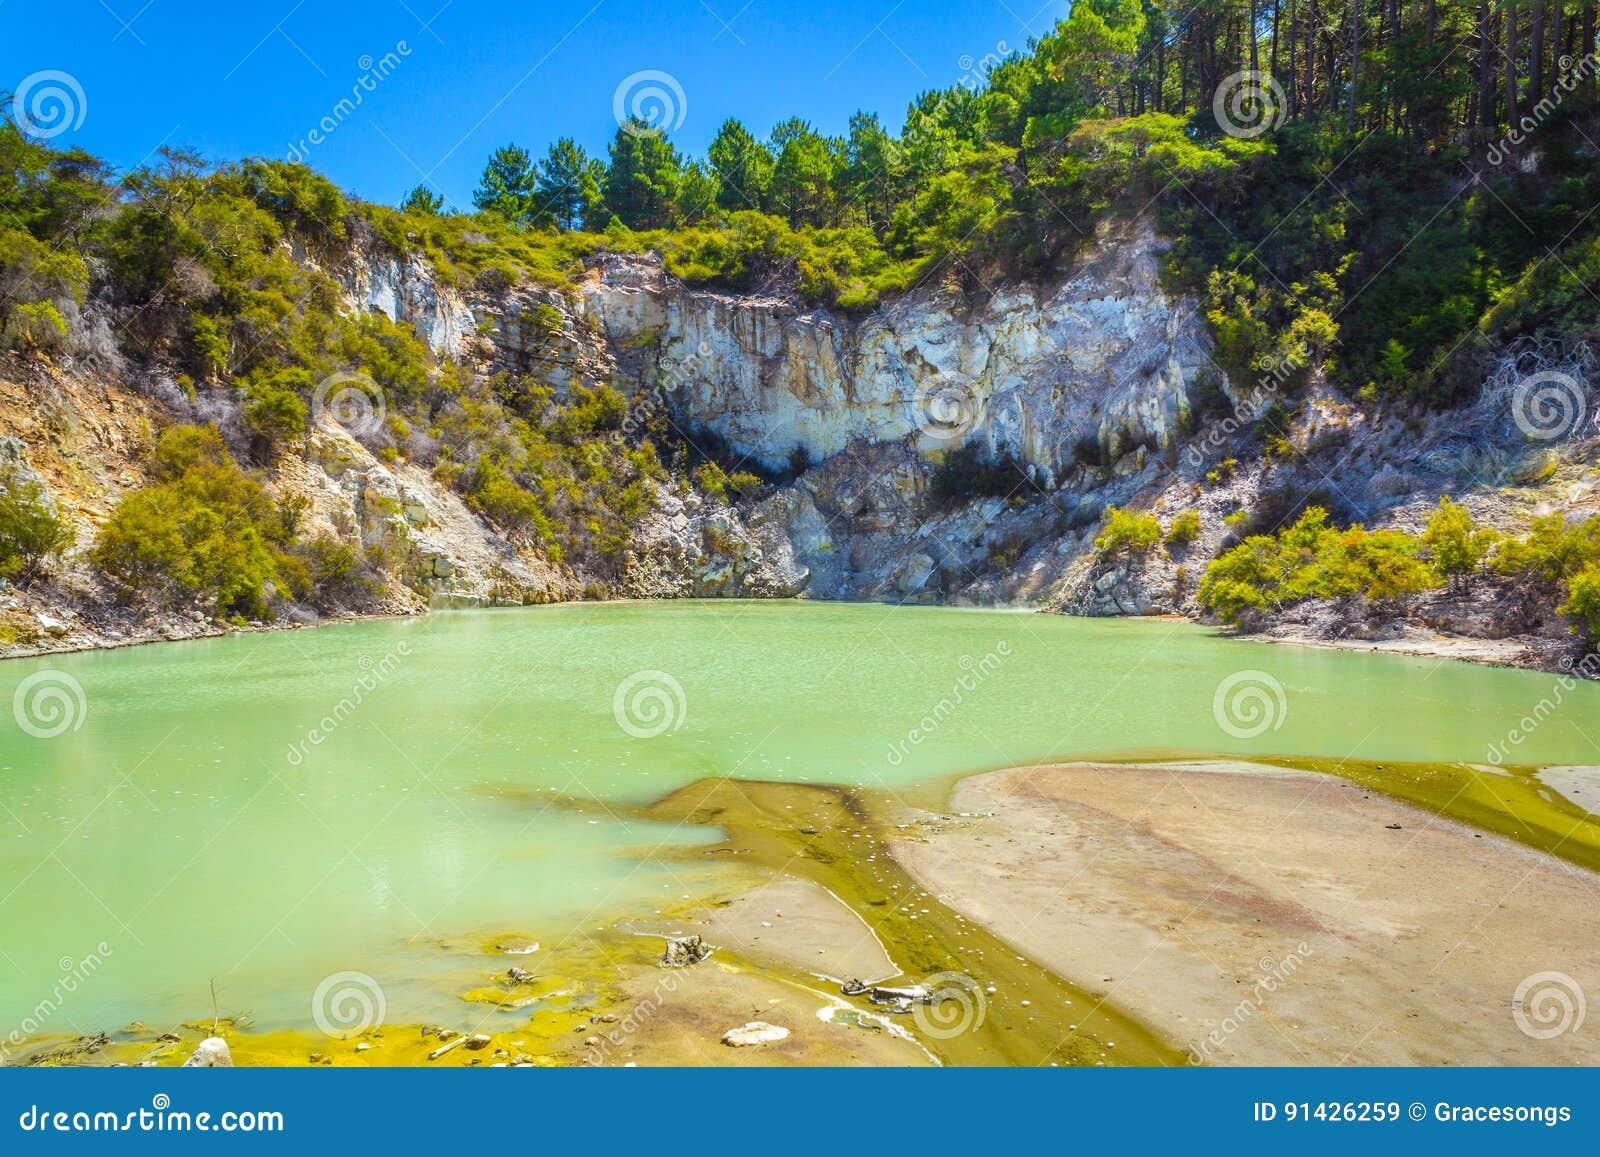 Geothermap-Pool an Wai-O-Tapu oder am heiligen Wasser